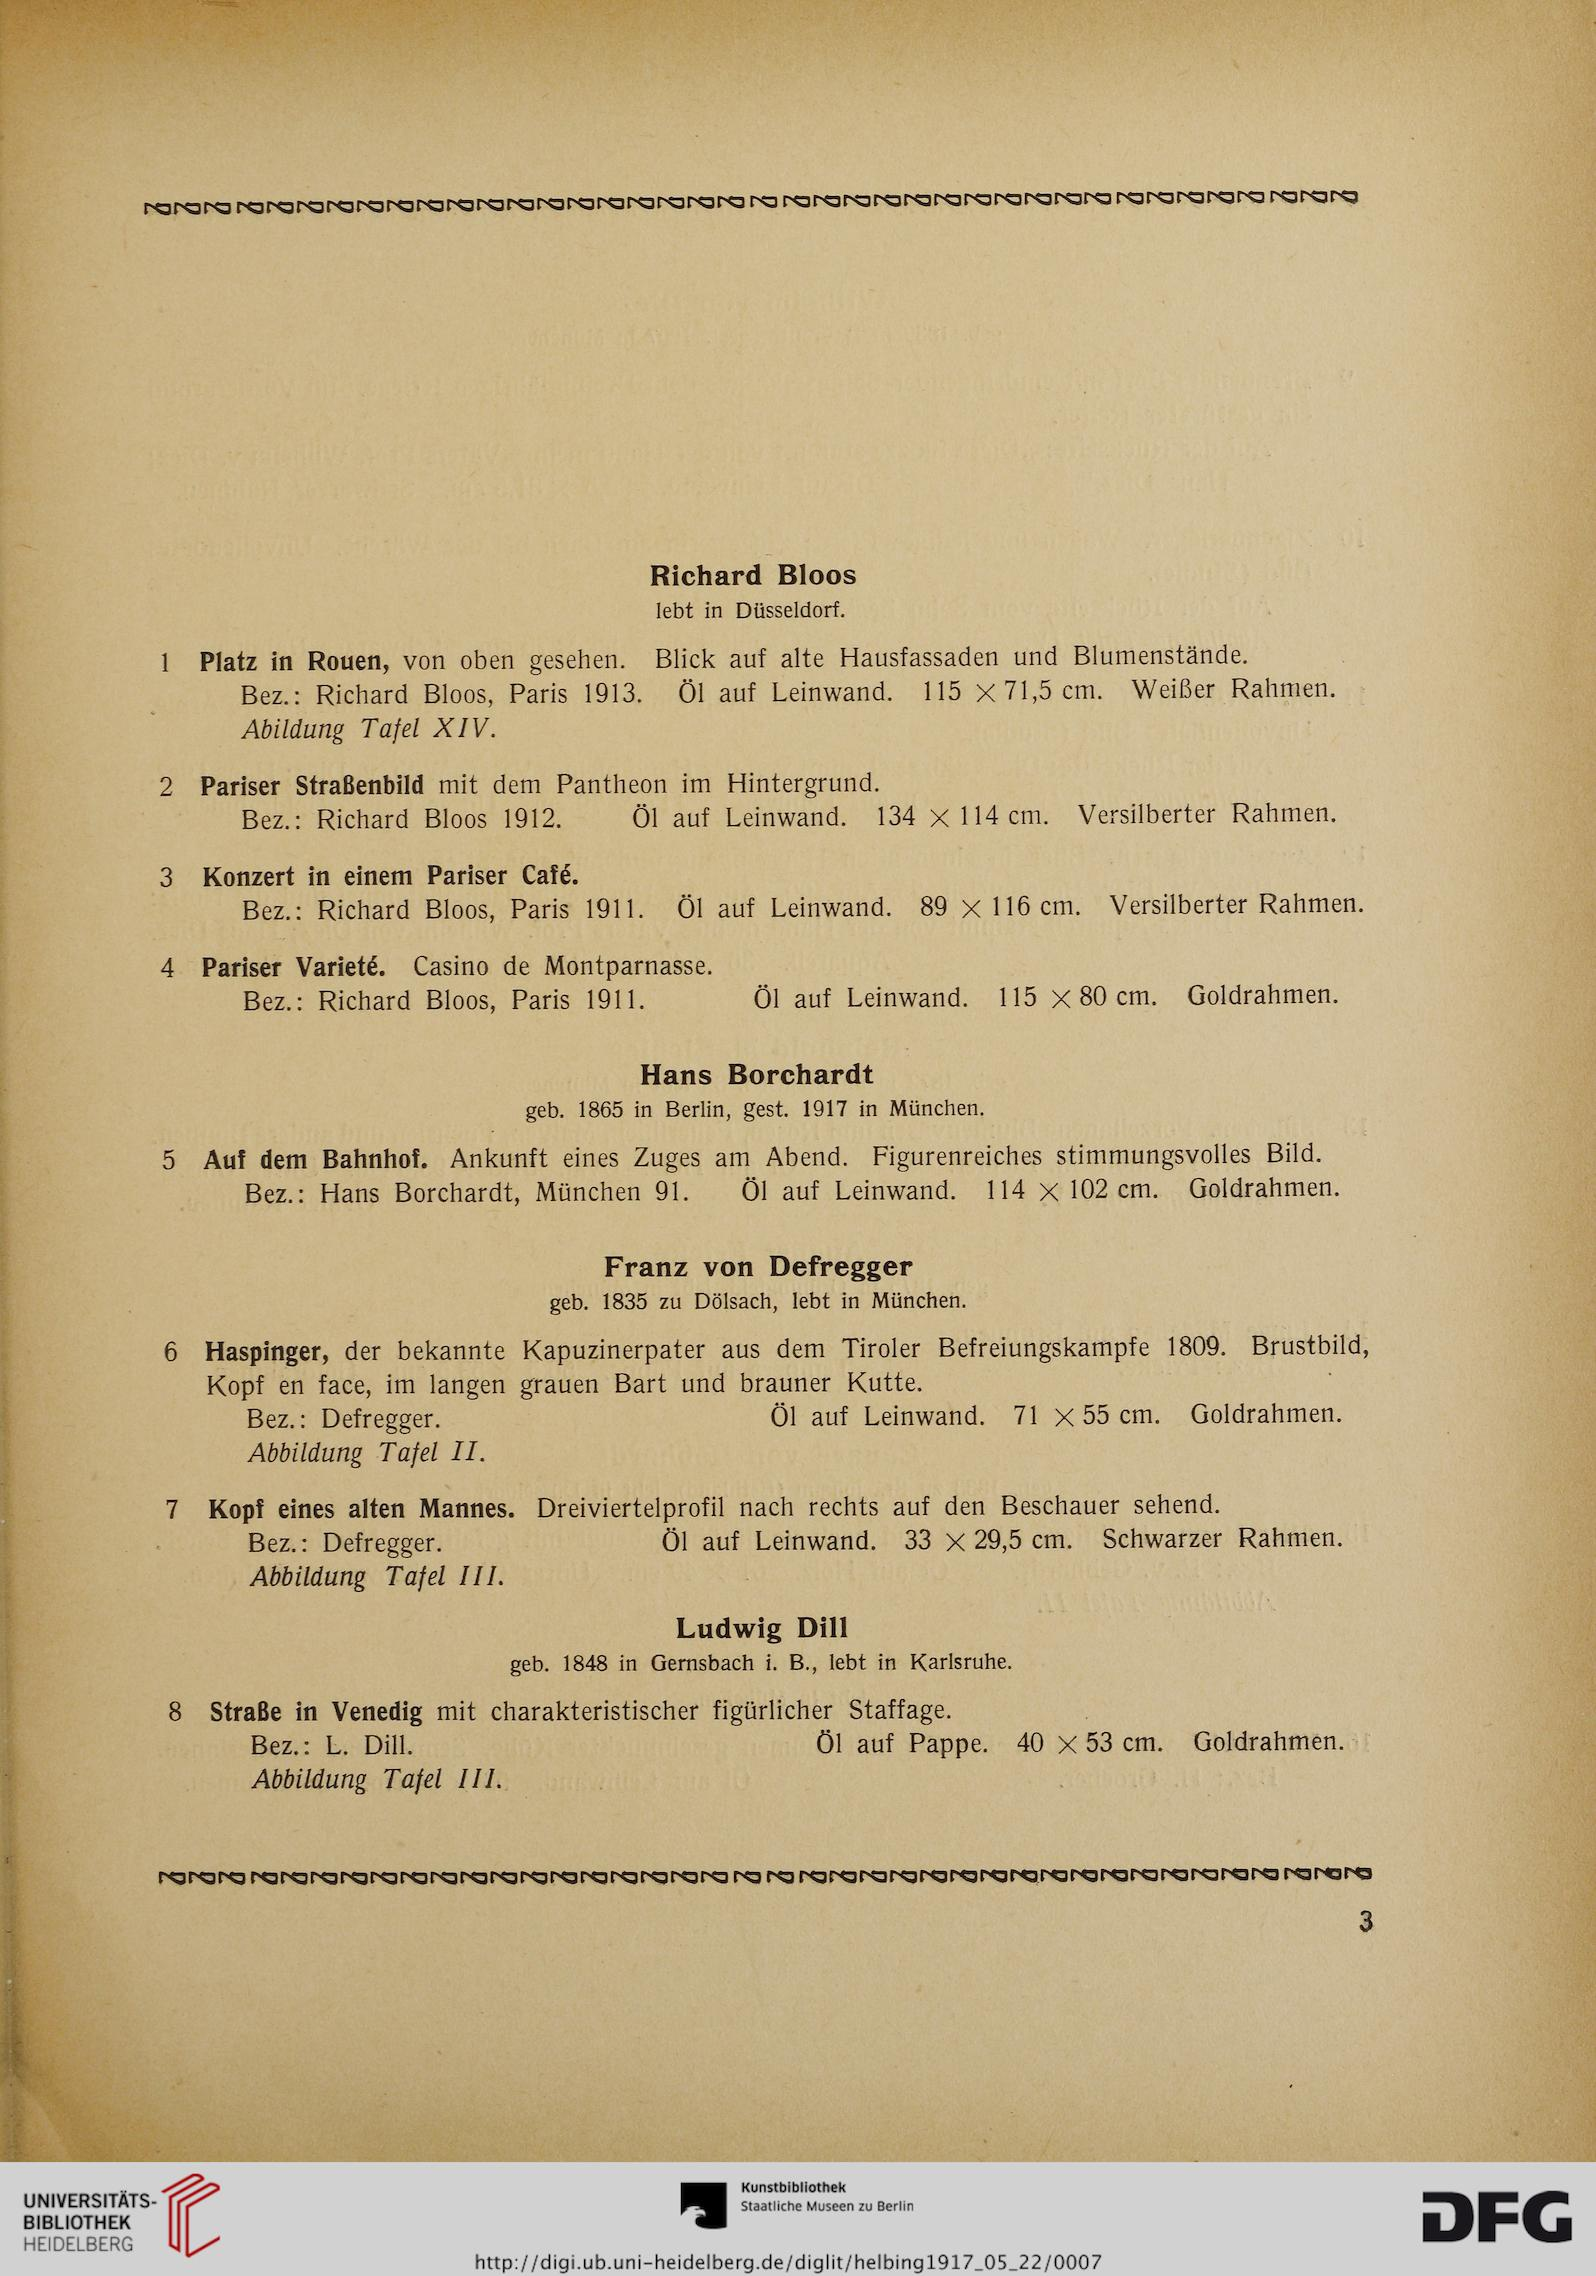 Hugo Helbing <München> [Hrsg.]: Ölgemälde moderner Meister aus ...